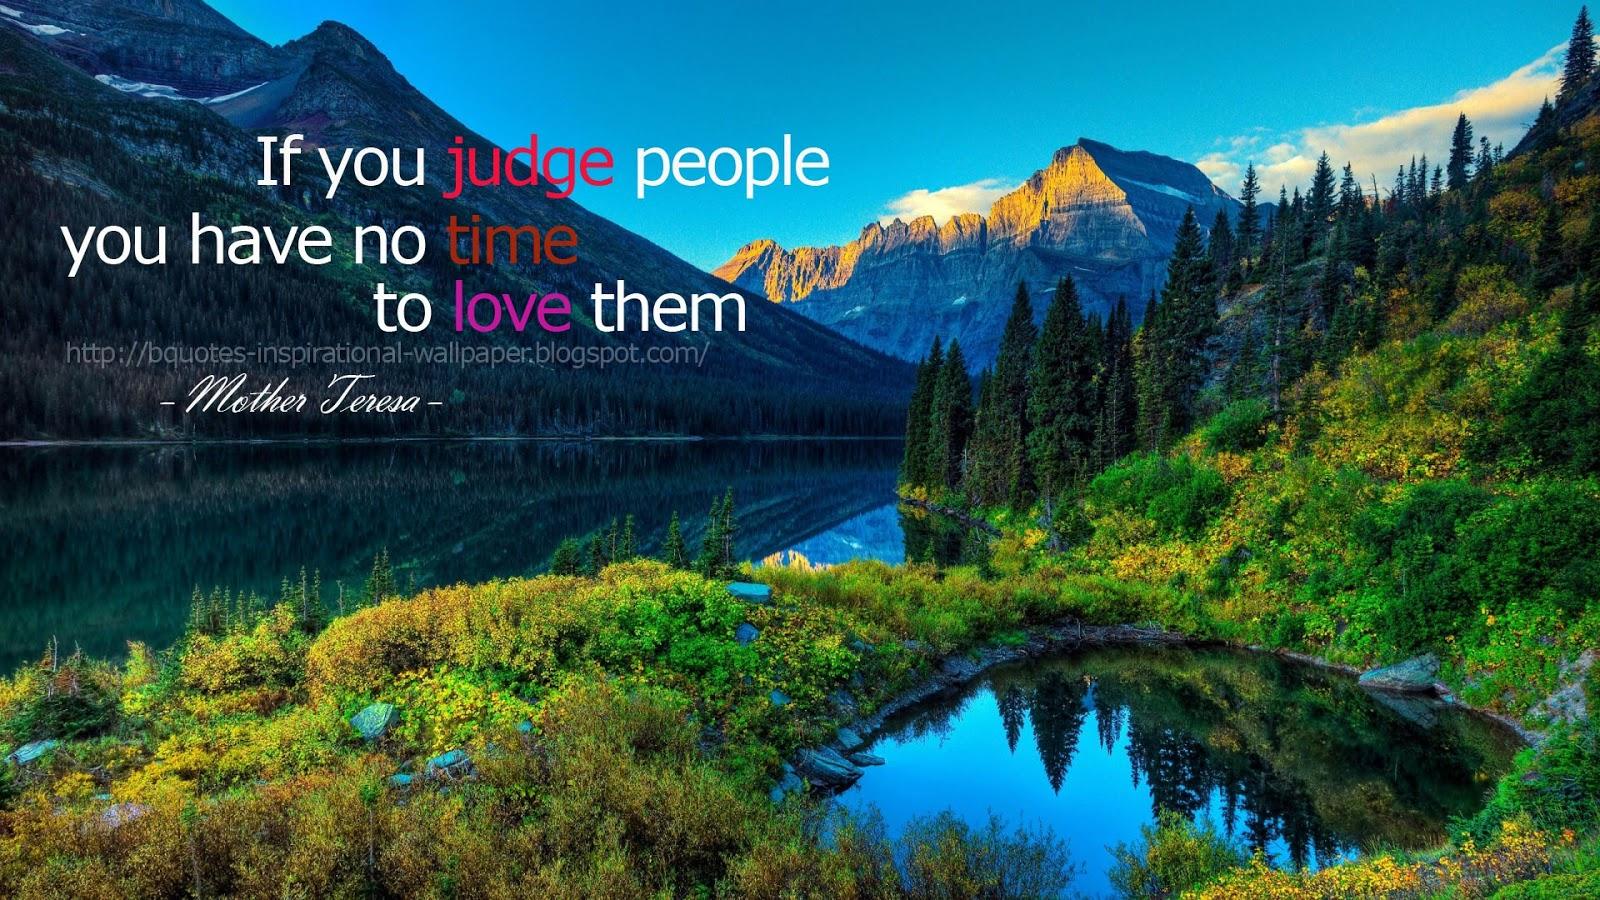 Top Wallpaper Mountain Quote - lake_mountain_scenery-bquotes-inspirational-wallpaper  Pic_706093.jpg